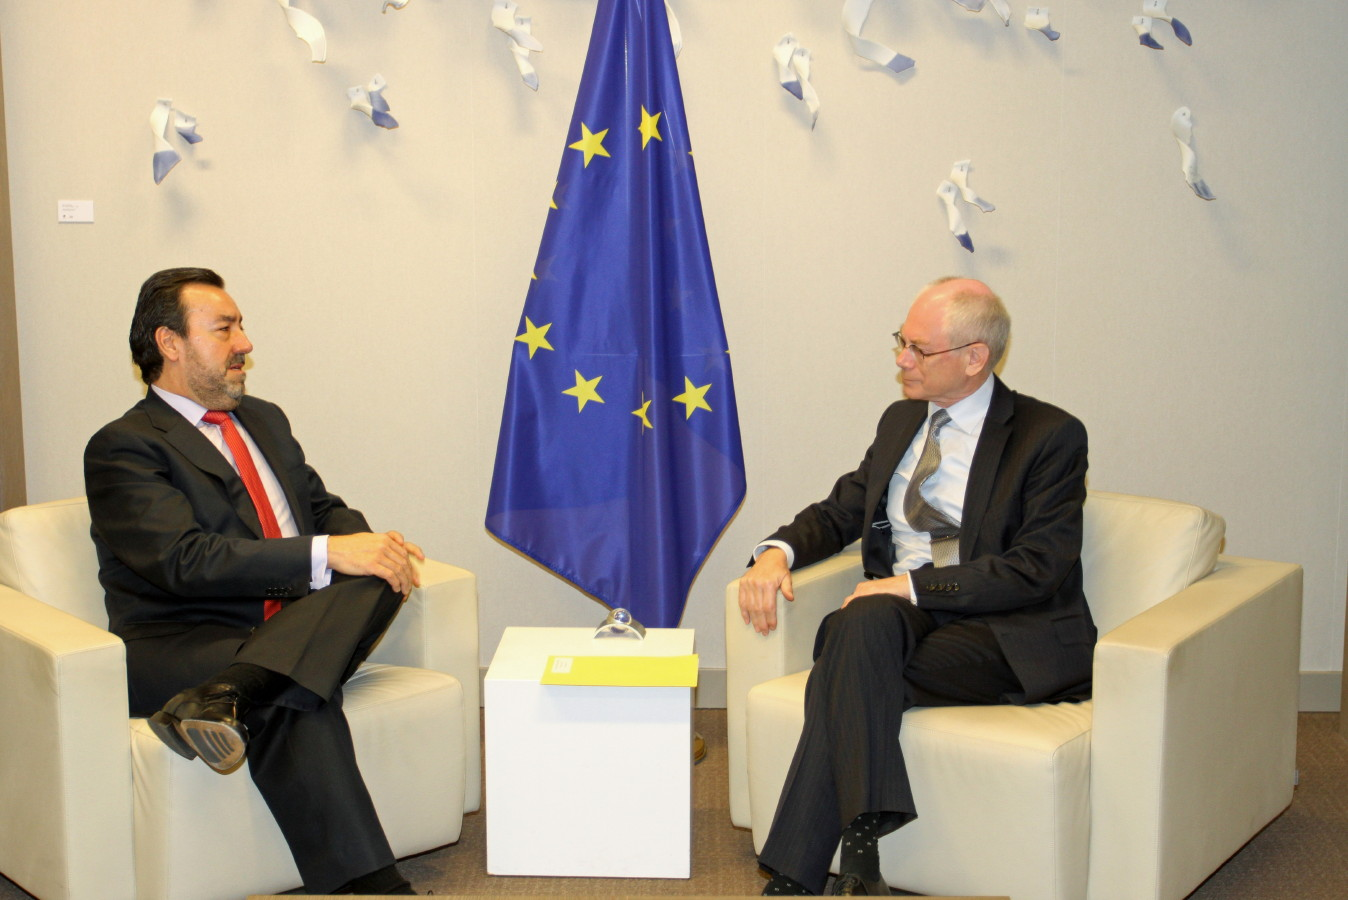 Van Rompuy Pte. Consejo Europeo